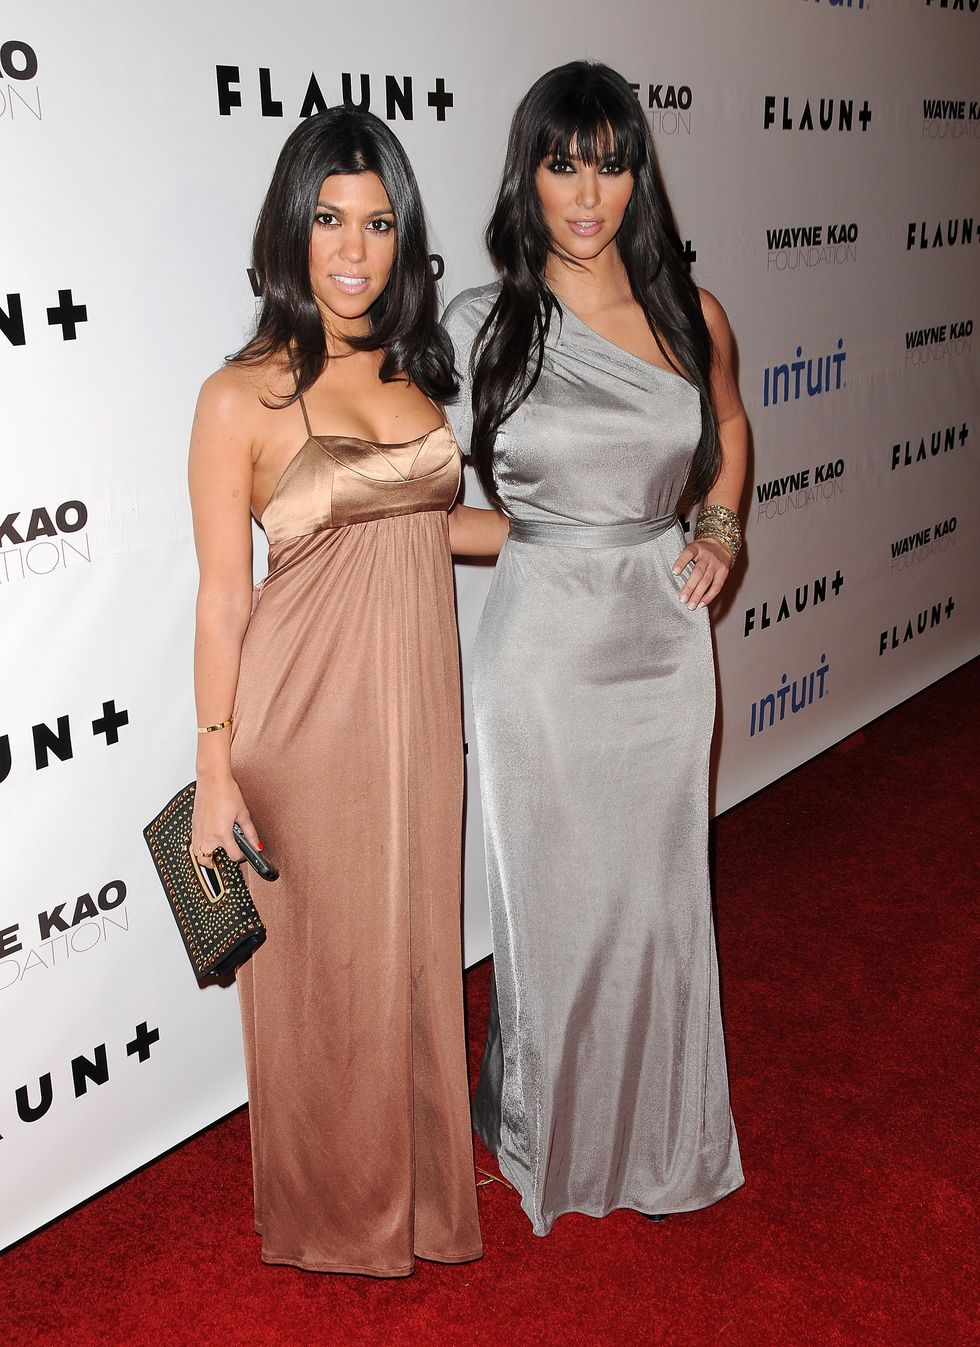 kim-and-kourtney-kardashian-flaunt-magazines-10th-anniversary-party-01